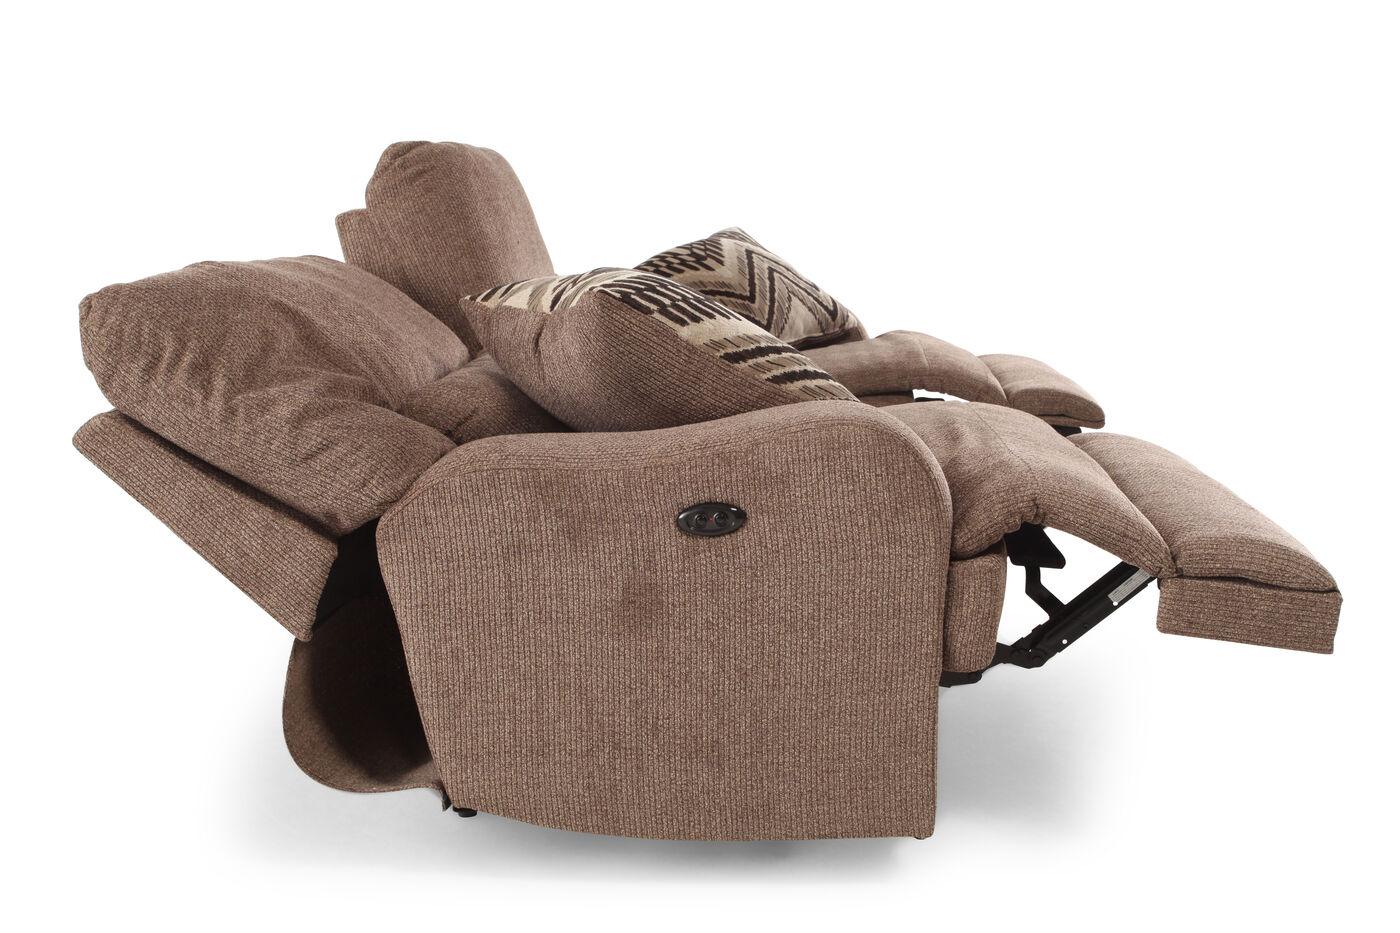 simmons verona recliner. power reclining simmons verona recliner